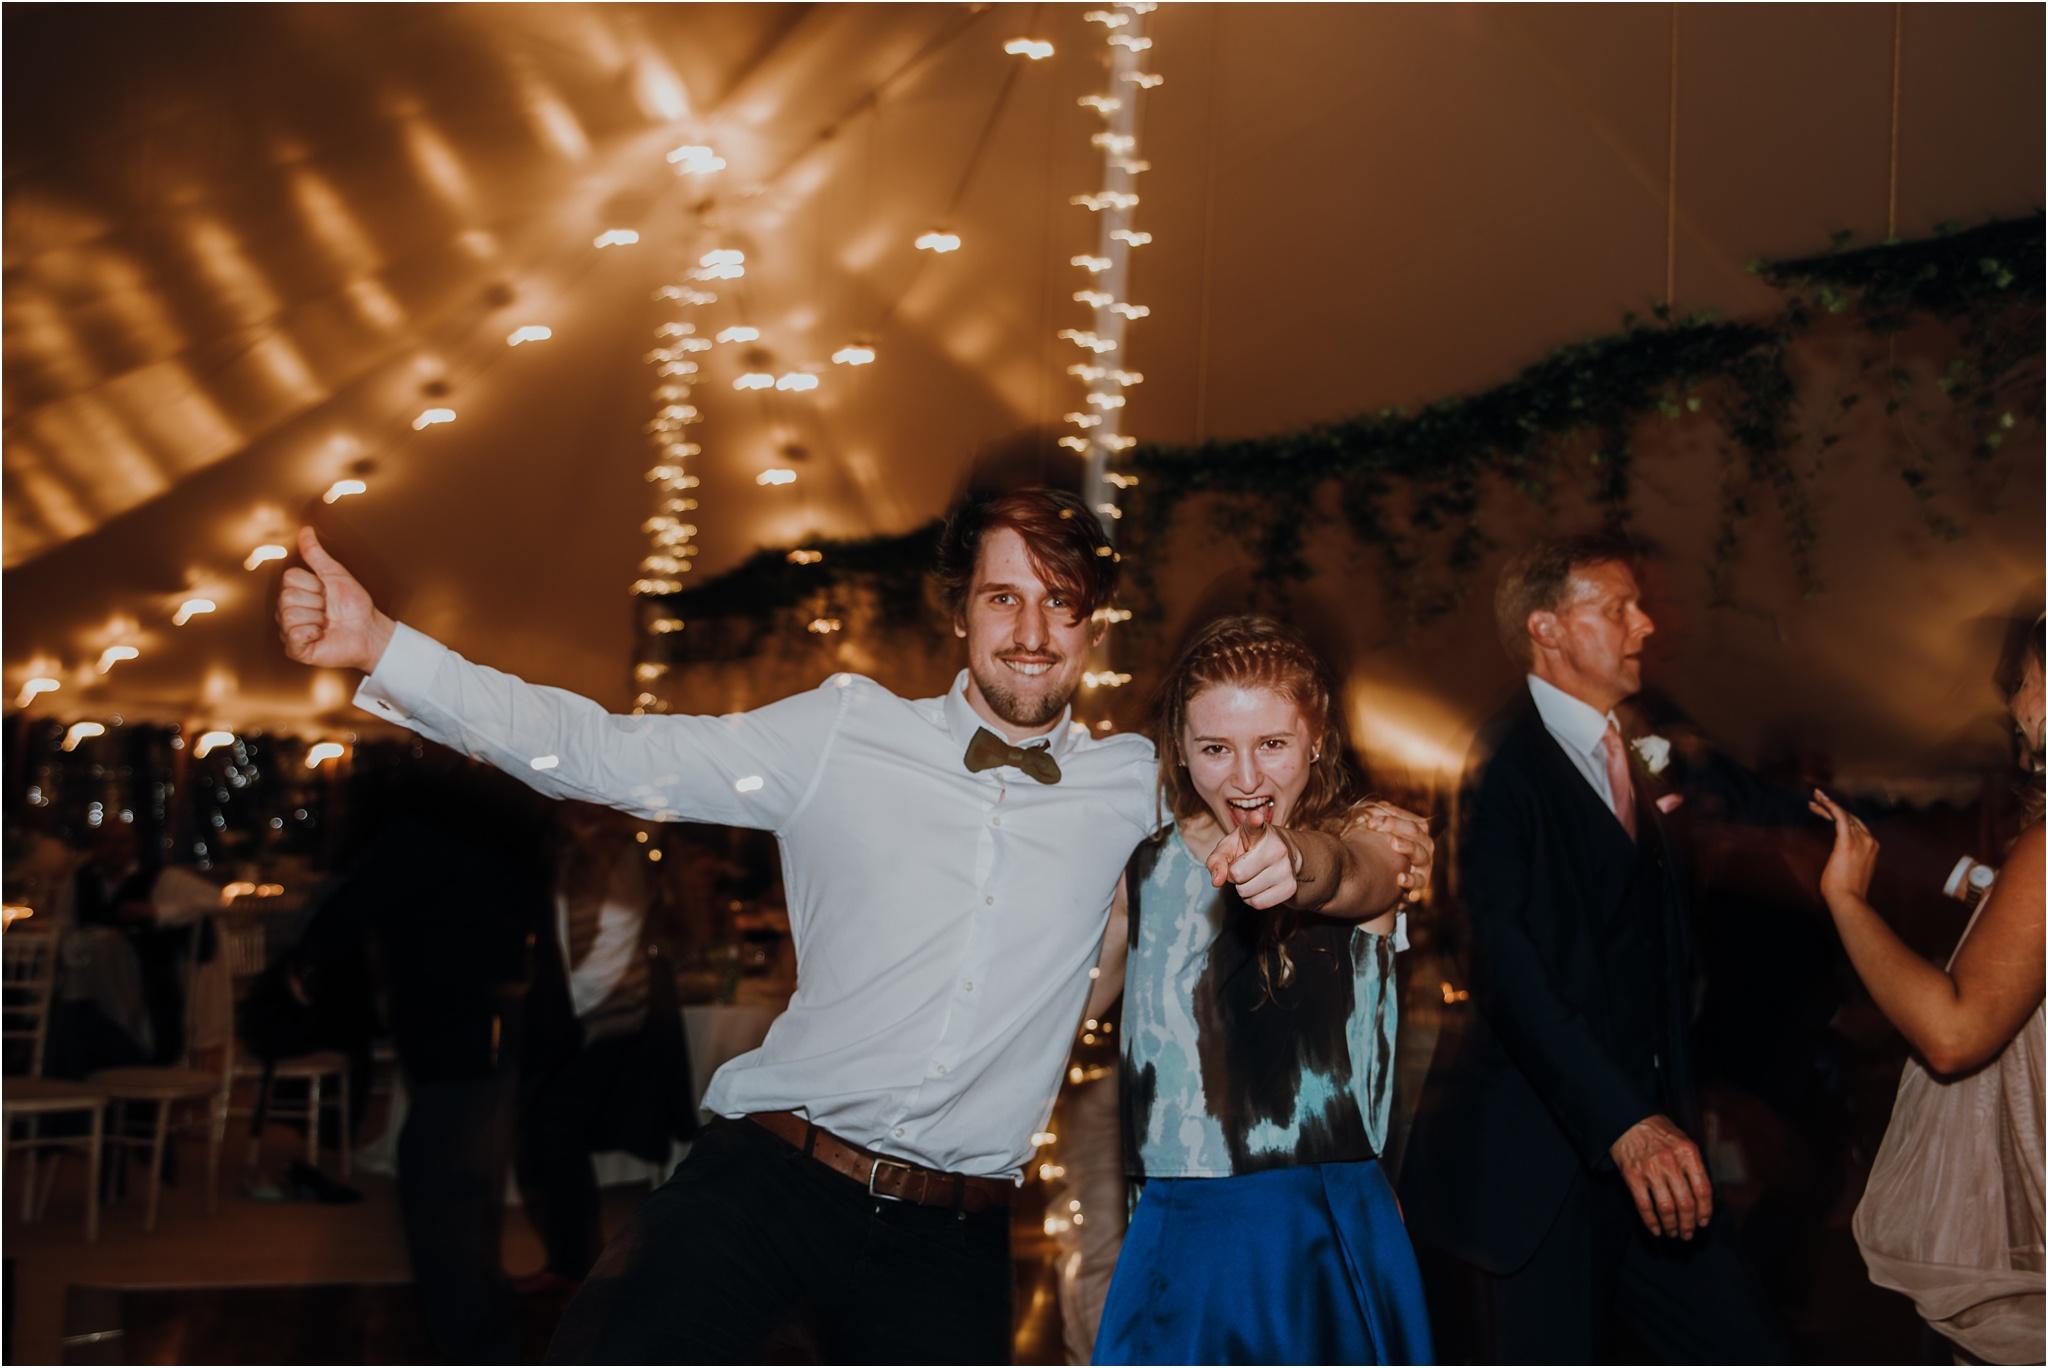 Outdoor-country-wedding-Edinburgh-photographer__0144.jpg